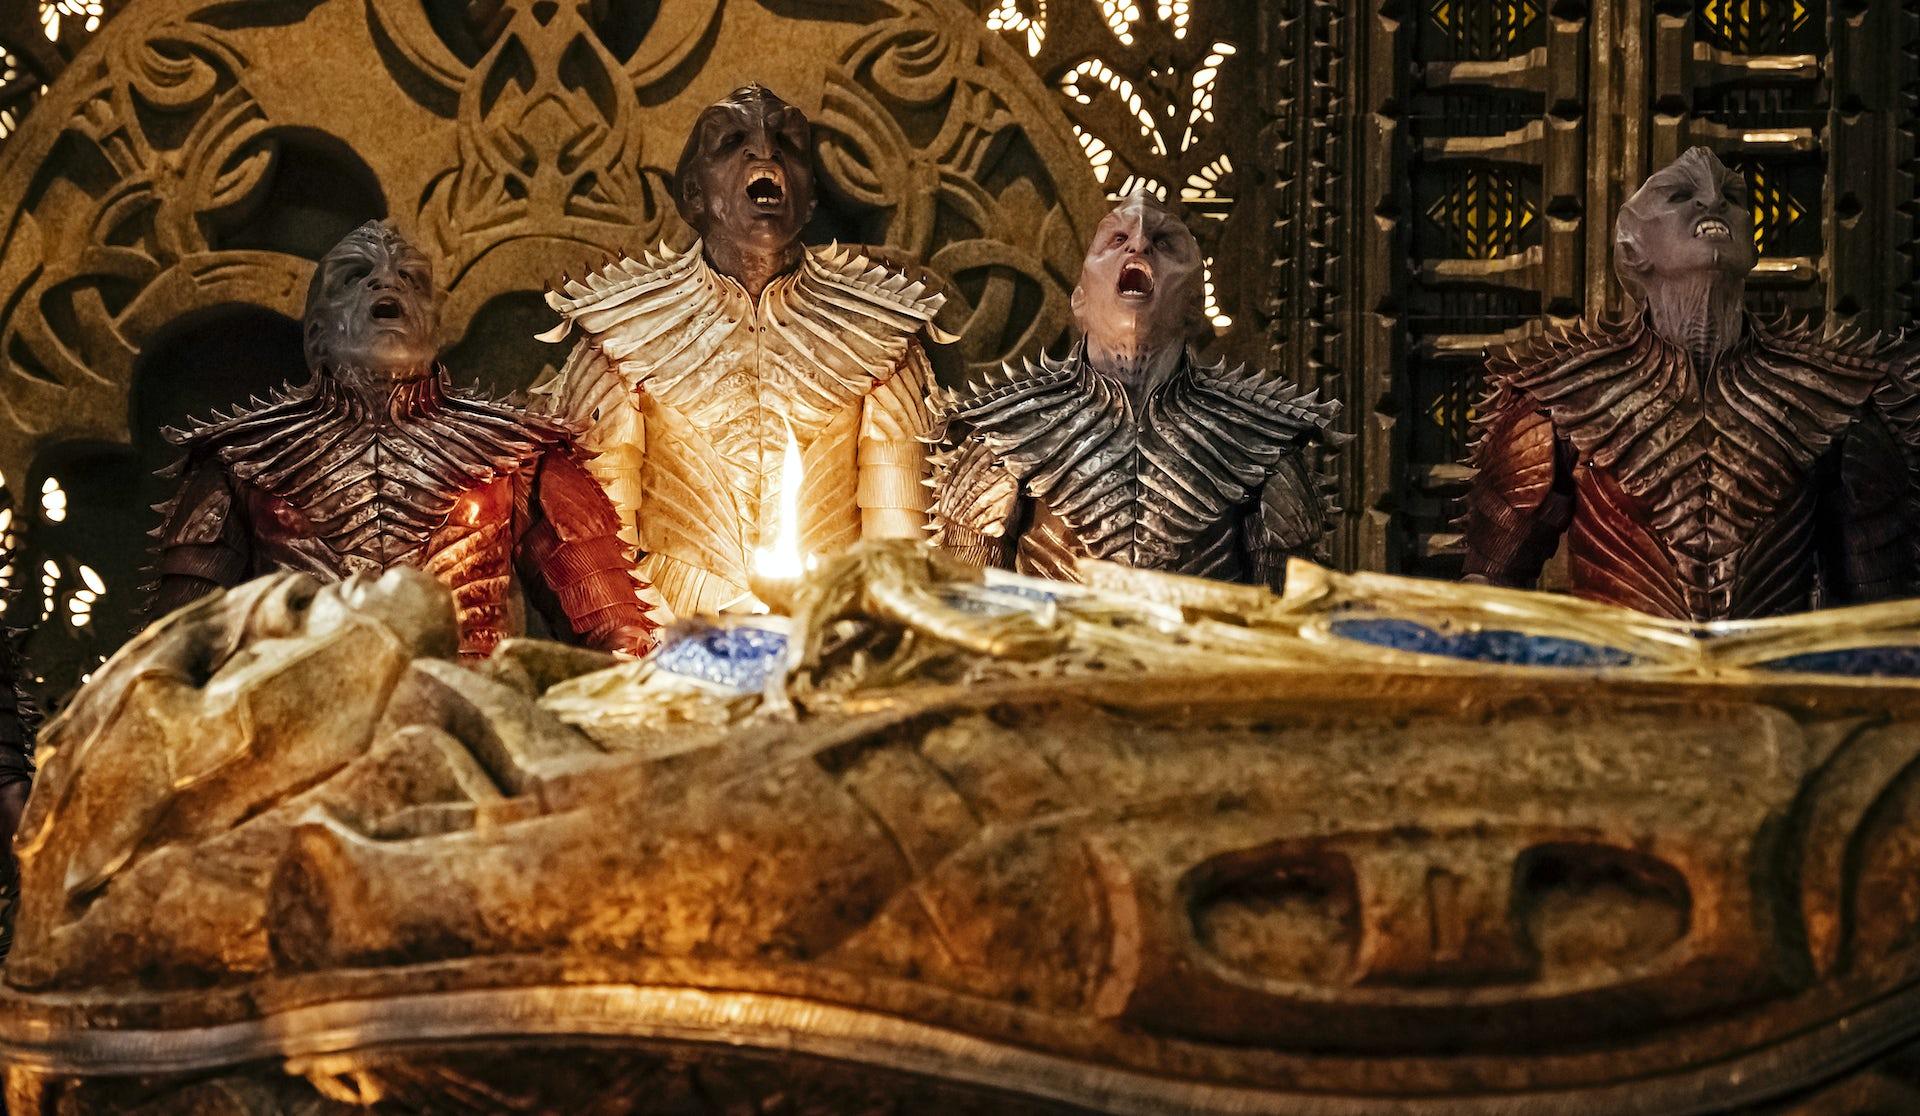 A ship of klingons